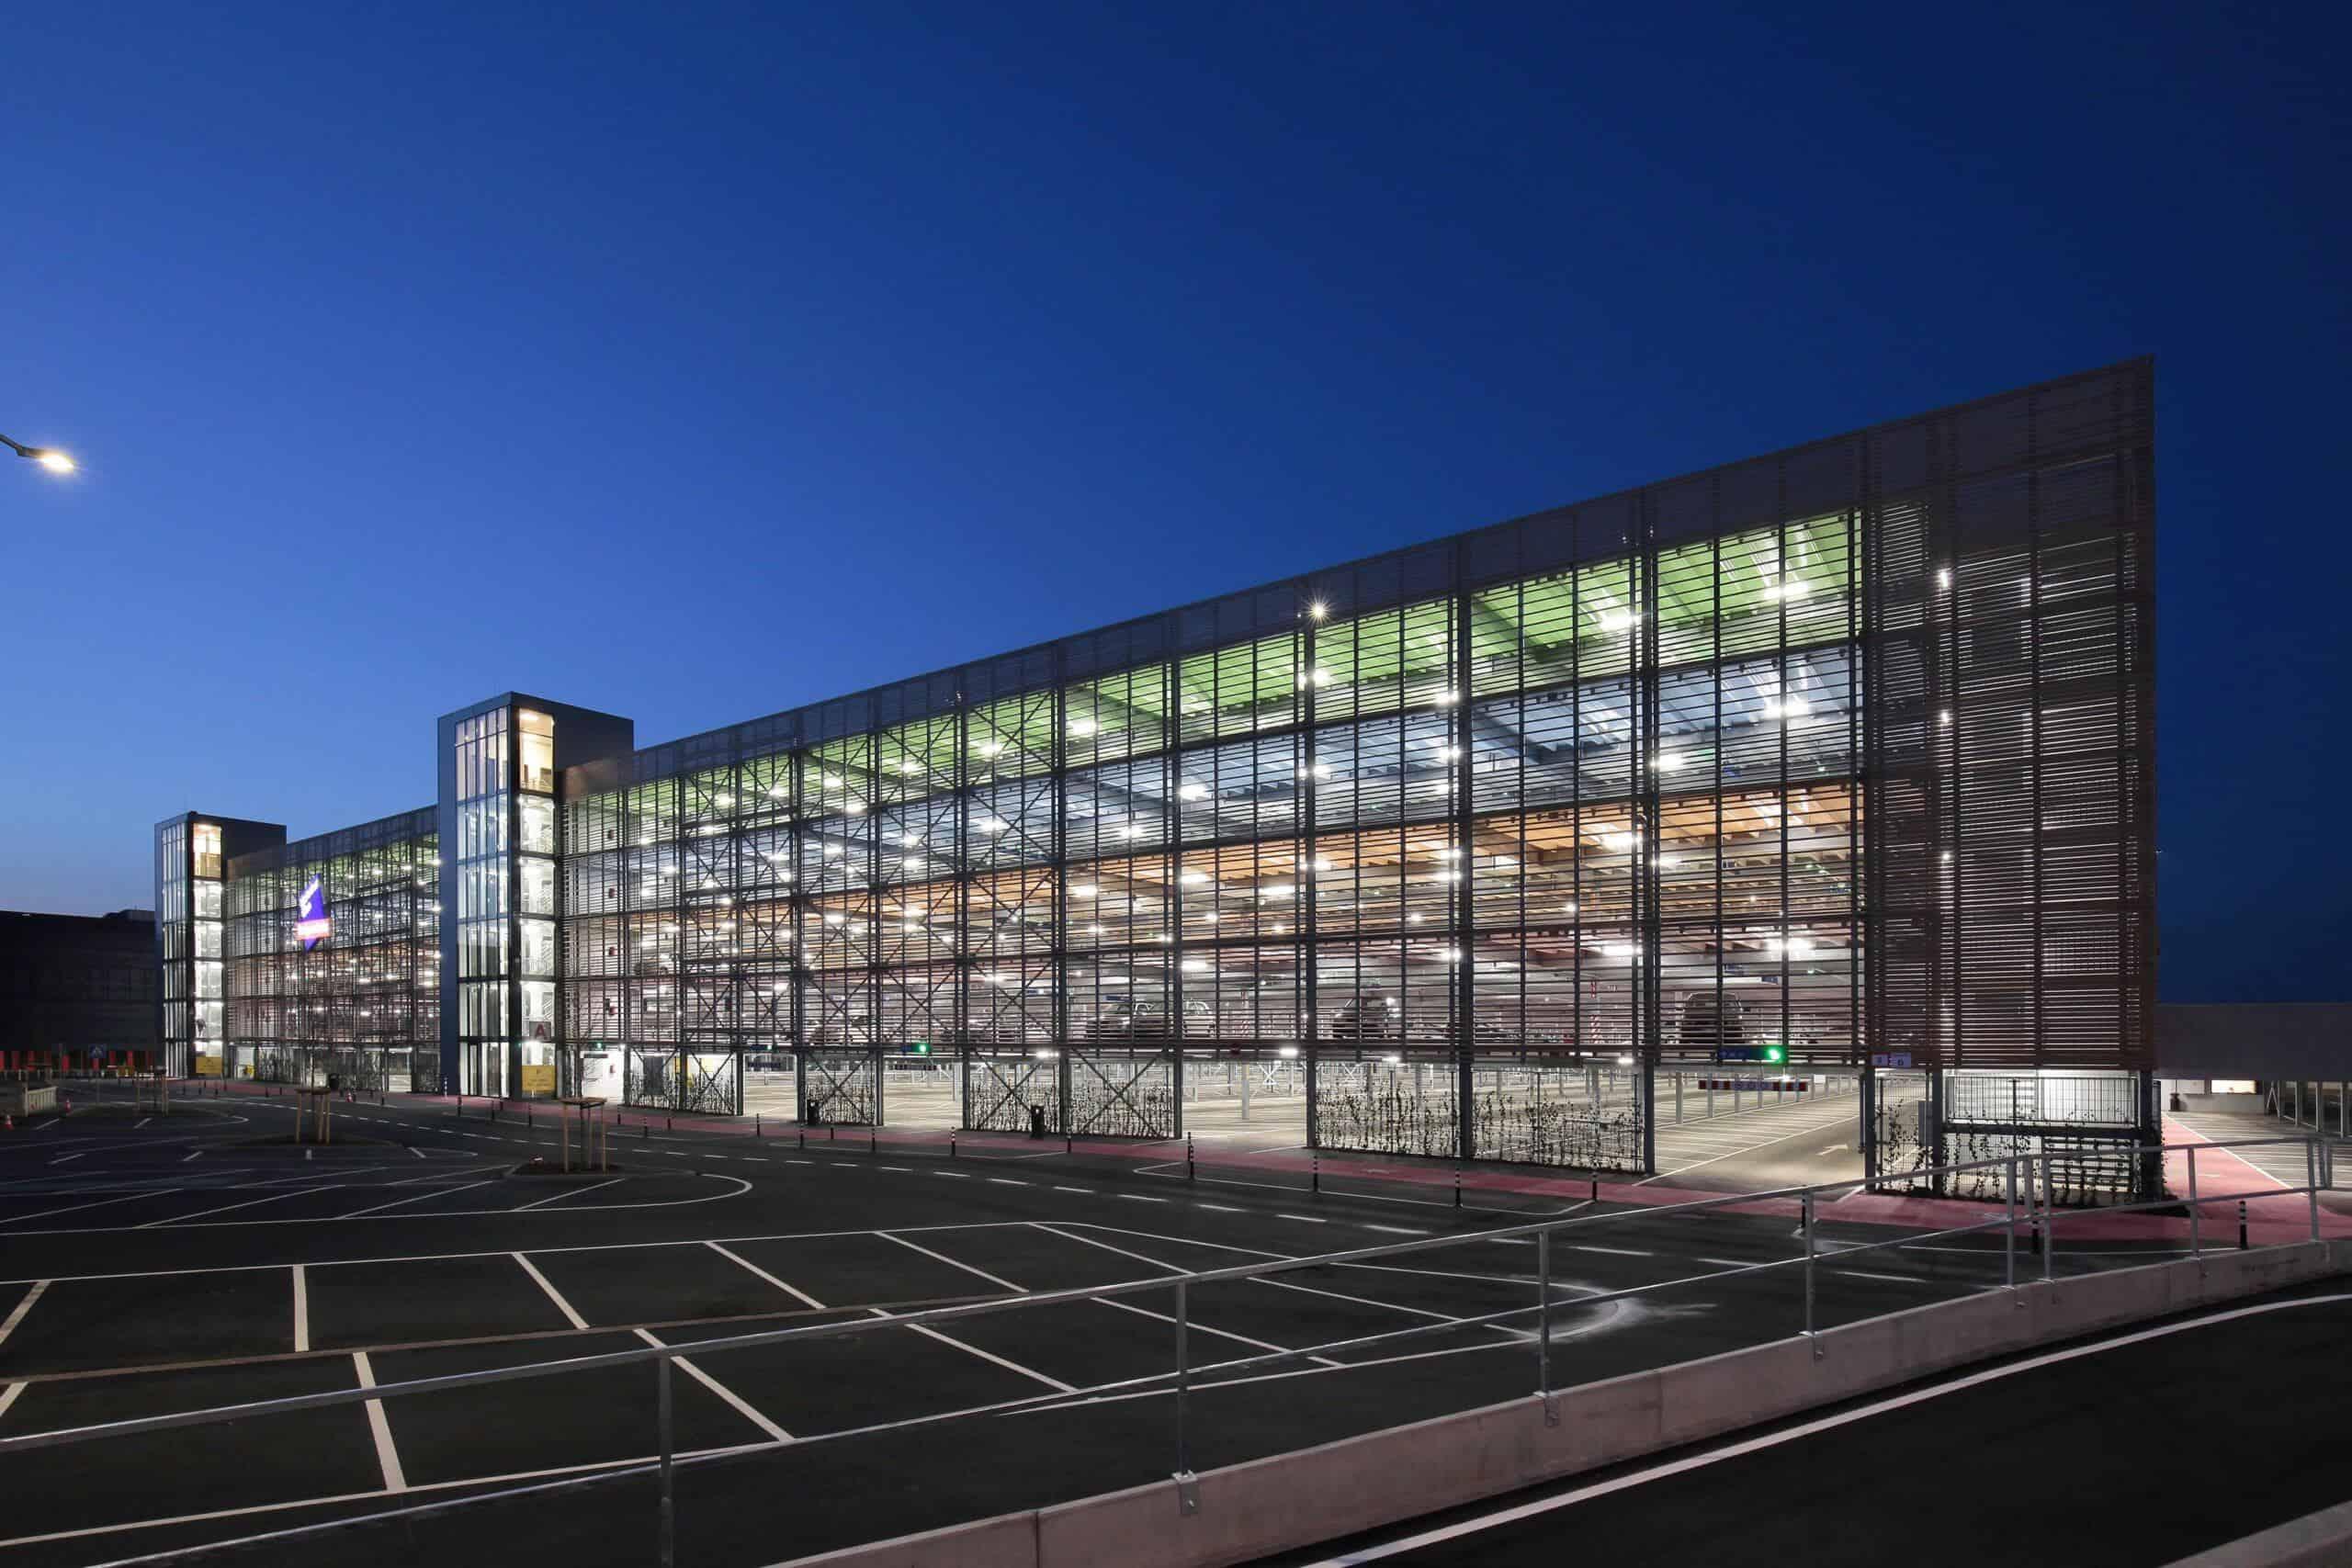 Parkeergarage Designer Outlet Center Roermond door Harry Noback